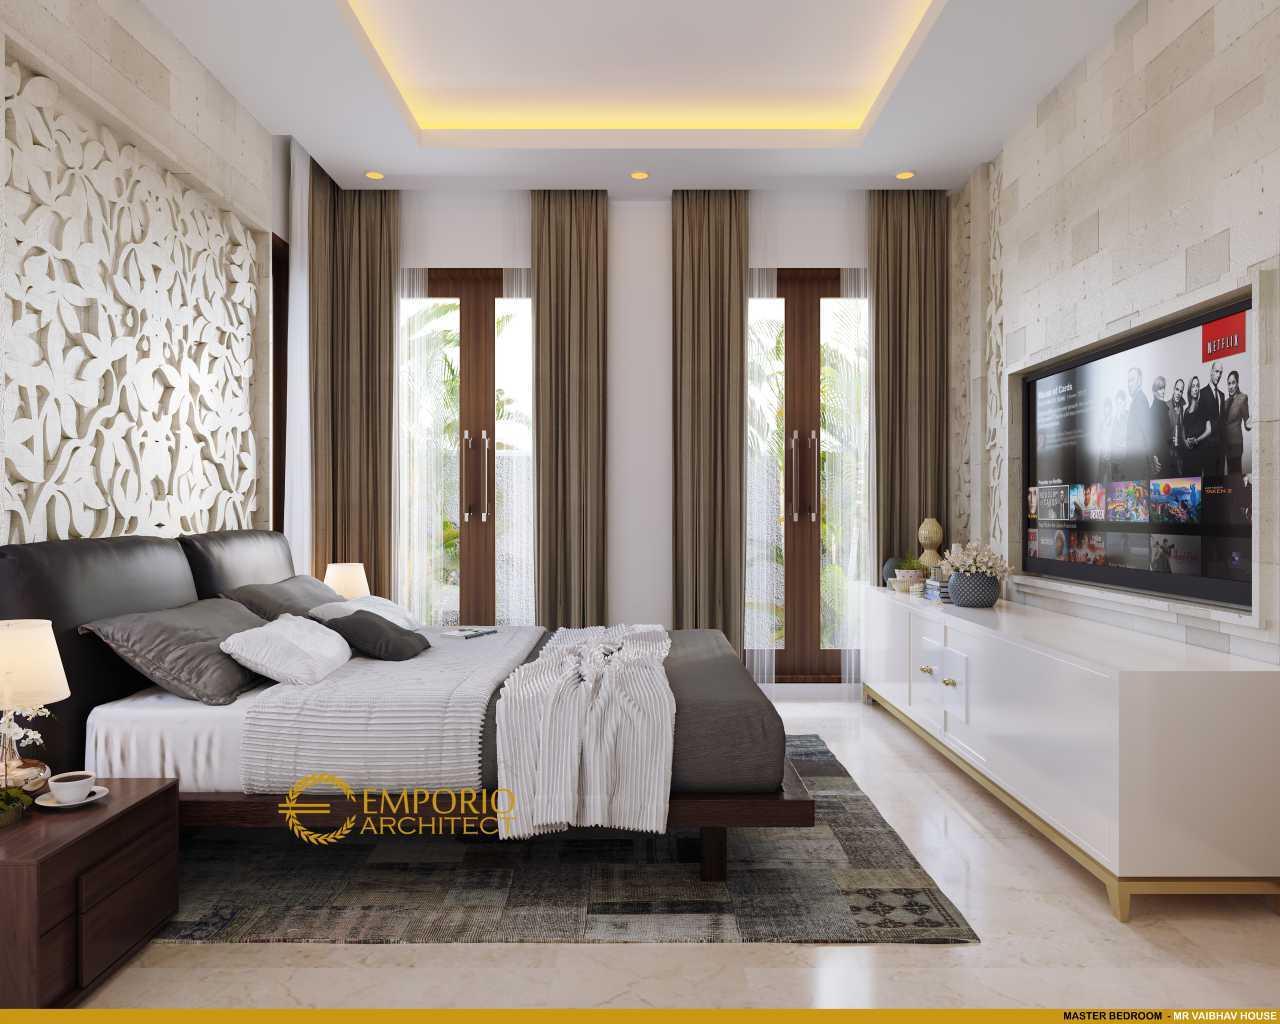 Emporio Architect Jasa Arsitek India Desain Rumah Villa Bali 2 Lantai 724 @ India India India Emporio-Architect-Jasa-Arsitek-India-Desain-Rumah-Villa-Bali-2-Lantai-724-India  93948